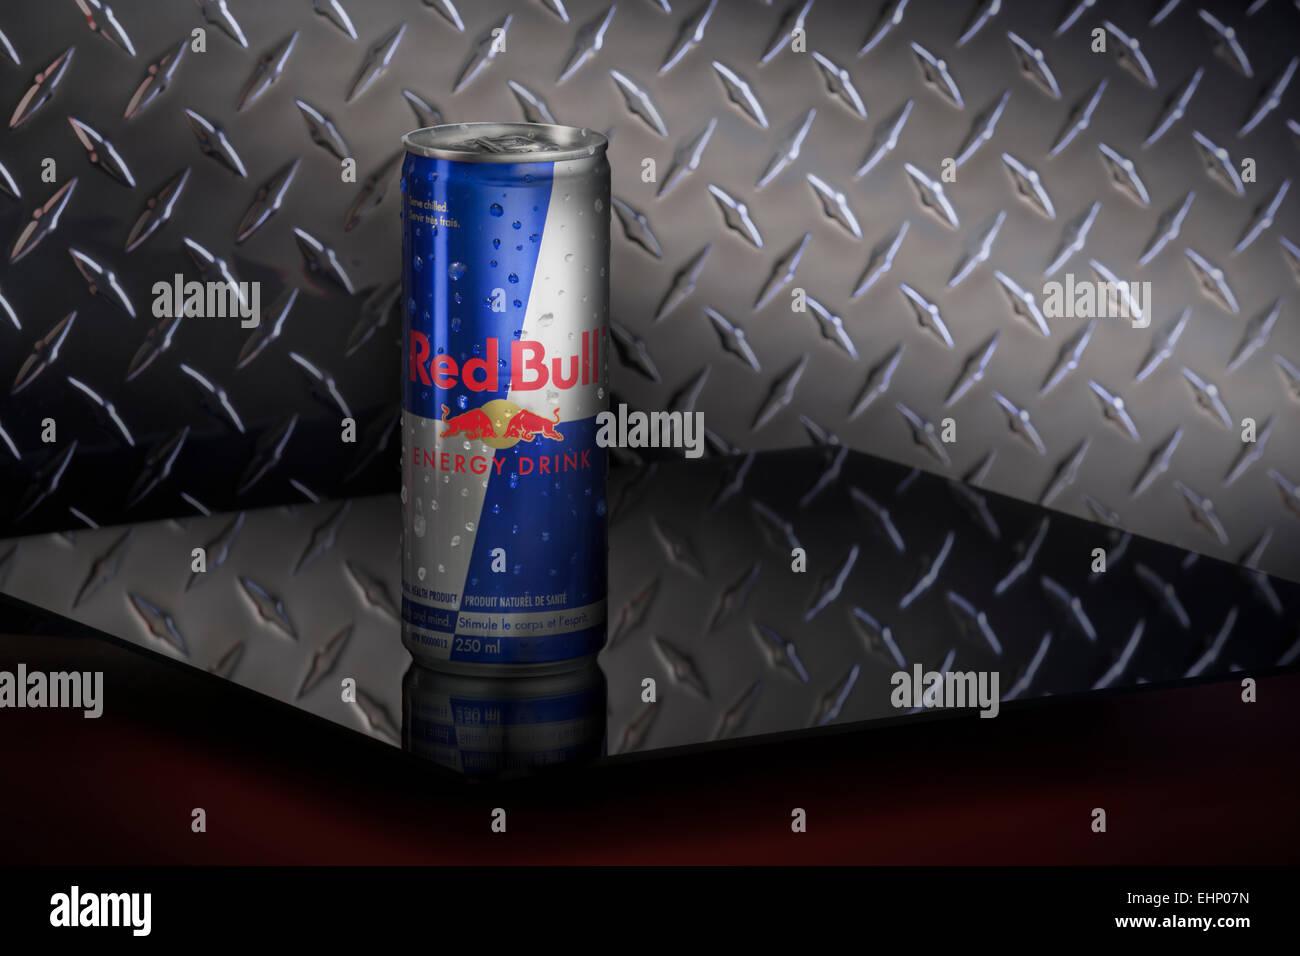 Red Bull Kühlschrank Kaufen Schweiz : Red bull kühlschrank schweiz: red bull ricardo. kühlschrank bull